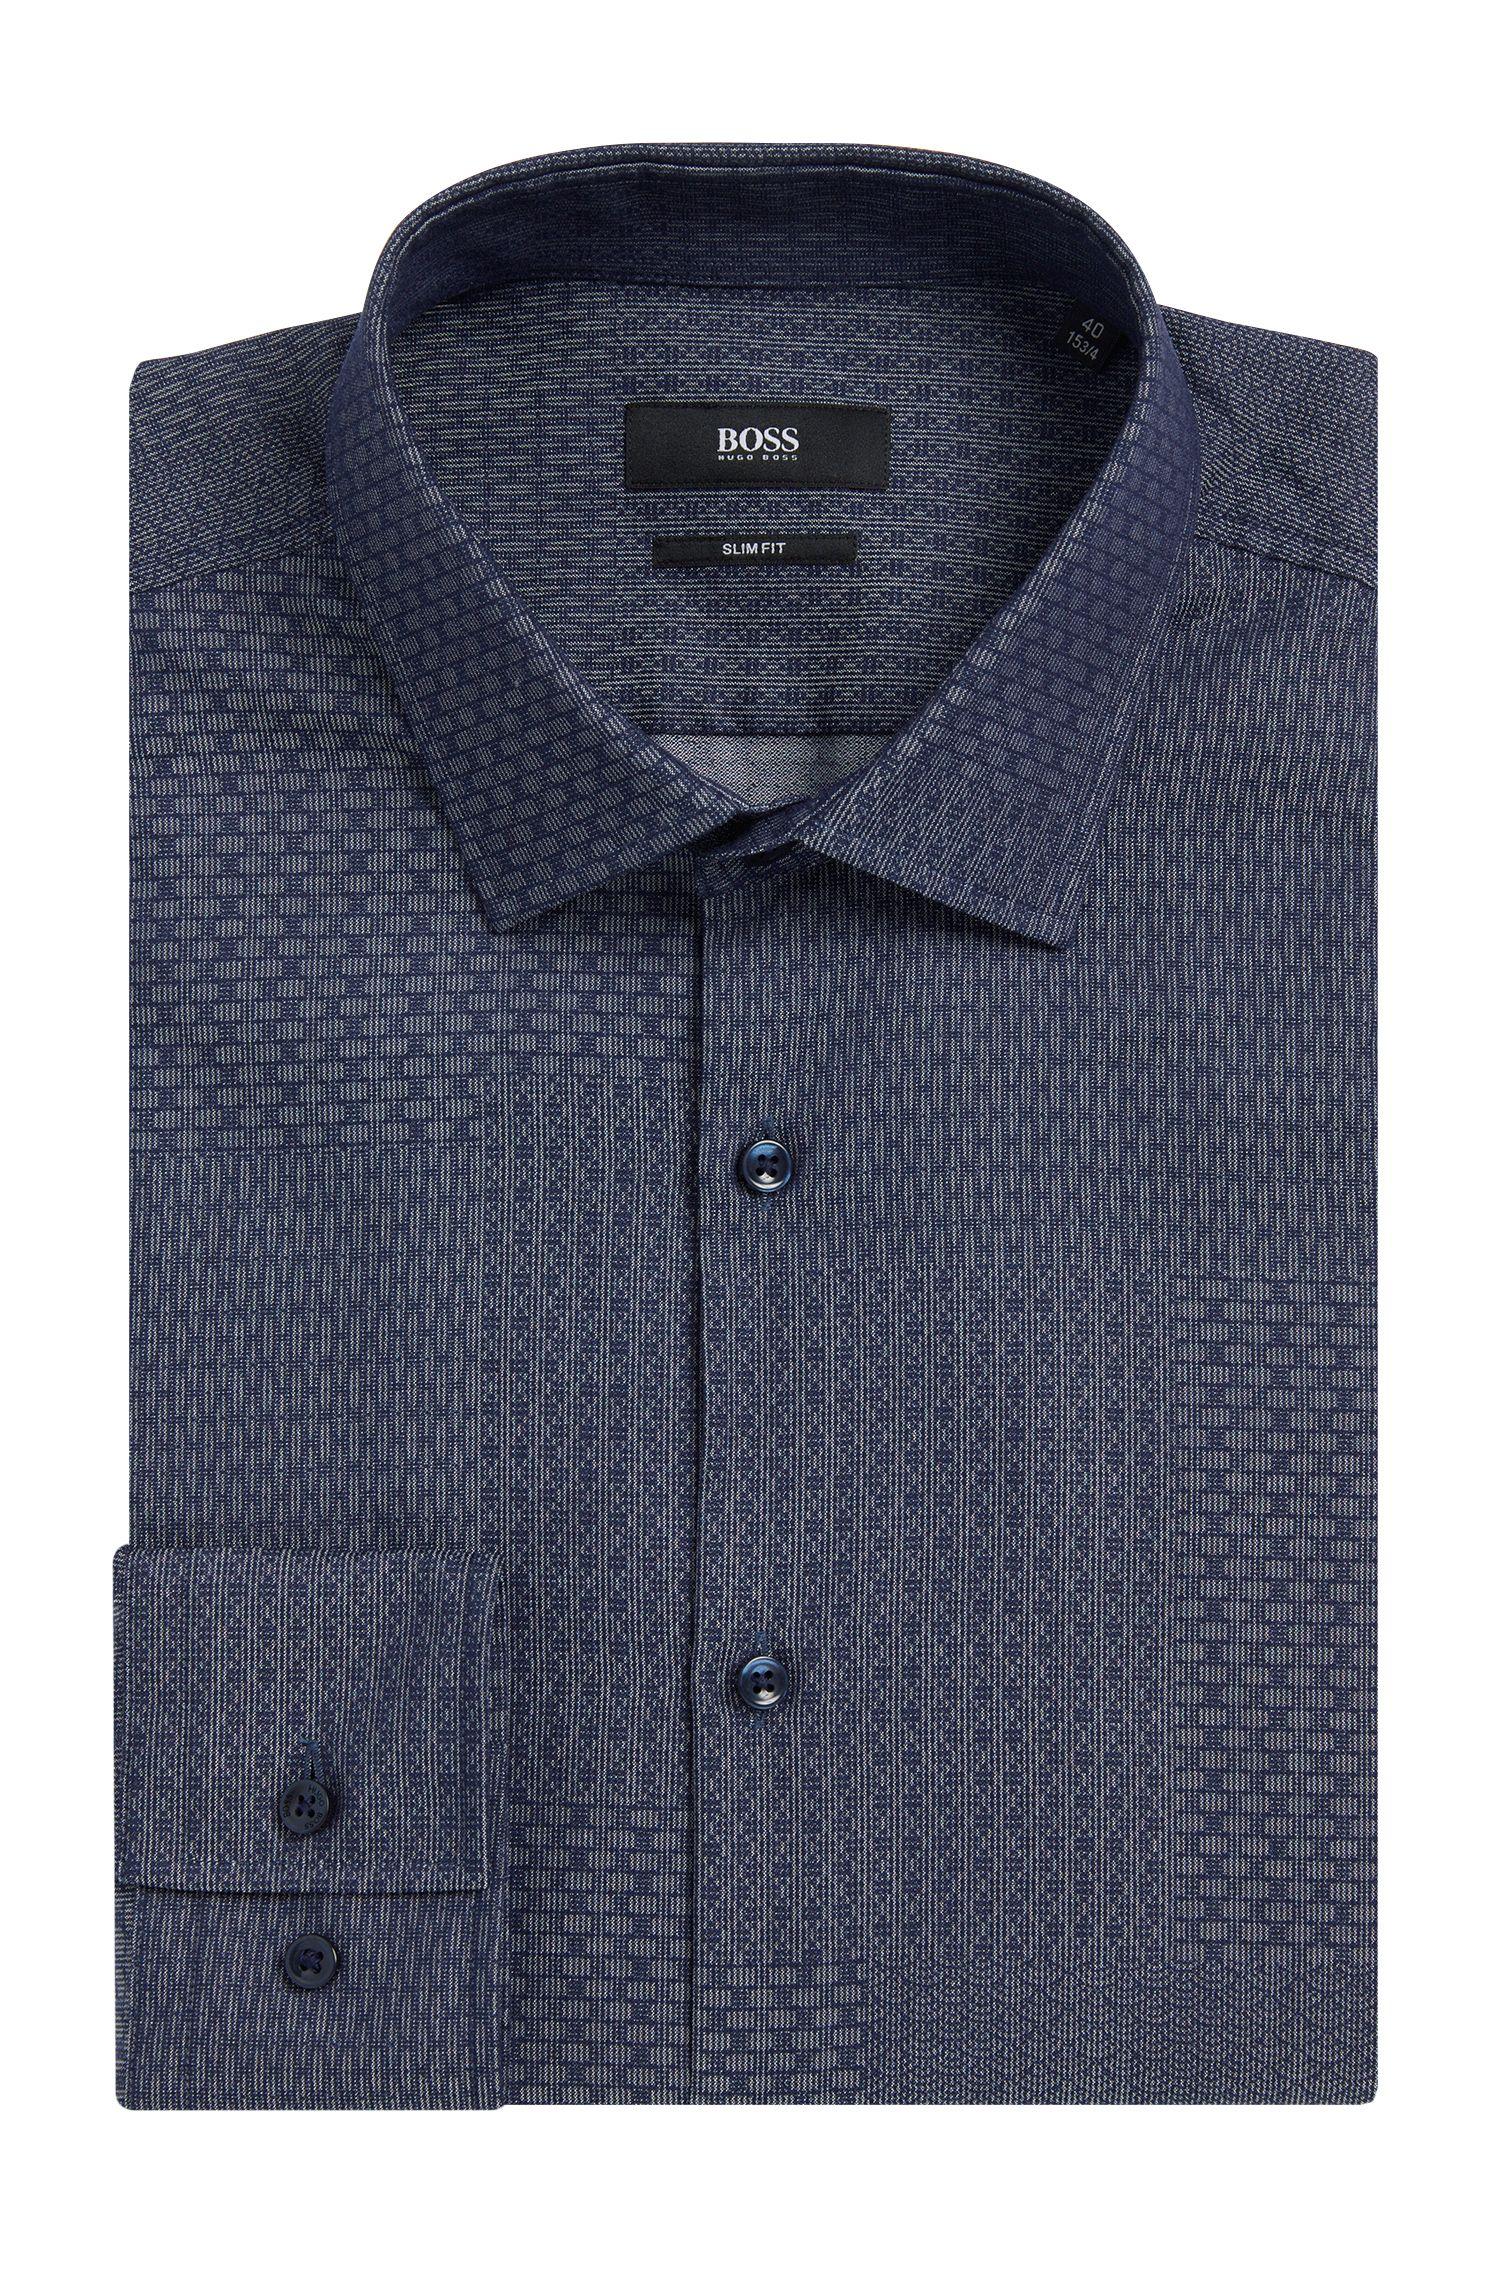 Dobby Patchwork Cotton Dress Shirt, Slim Fit | Jenno